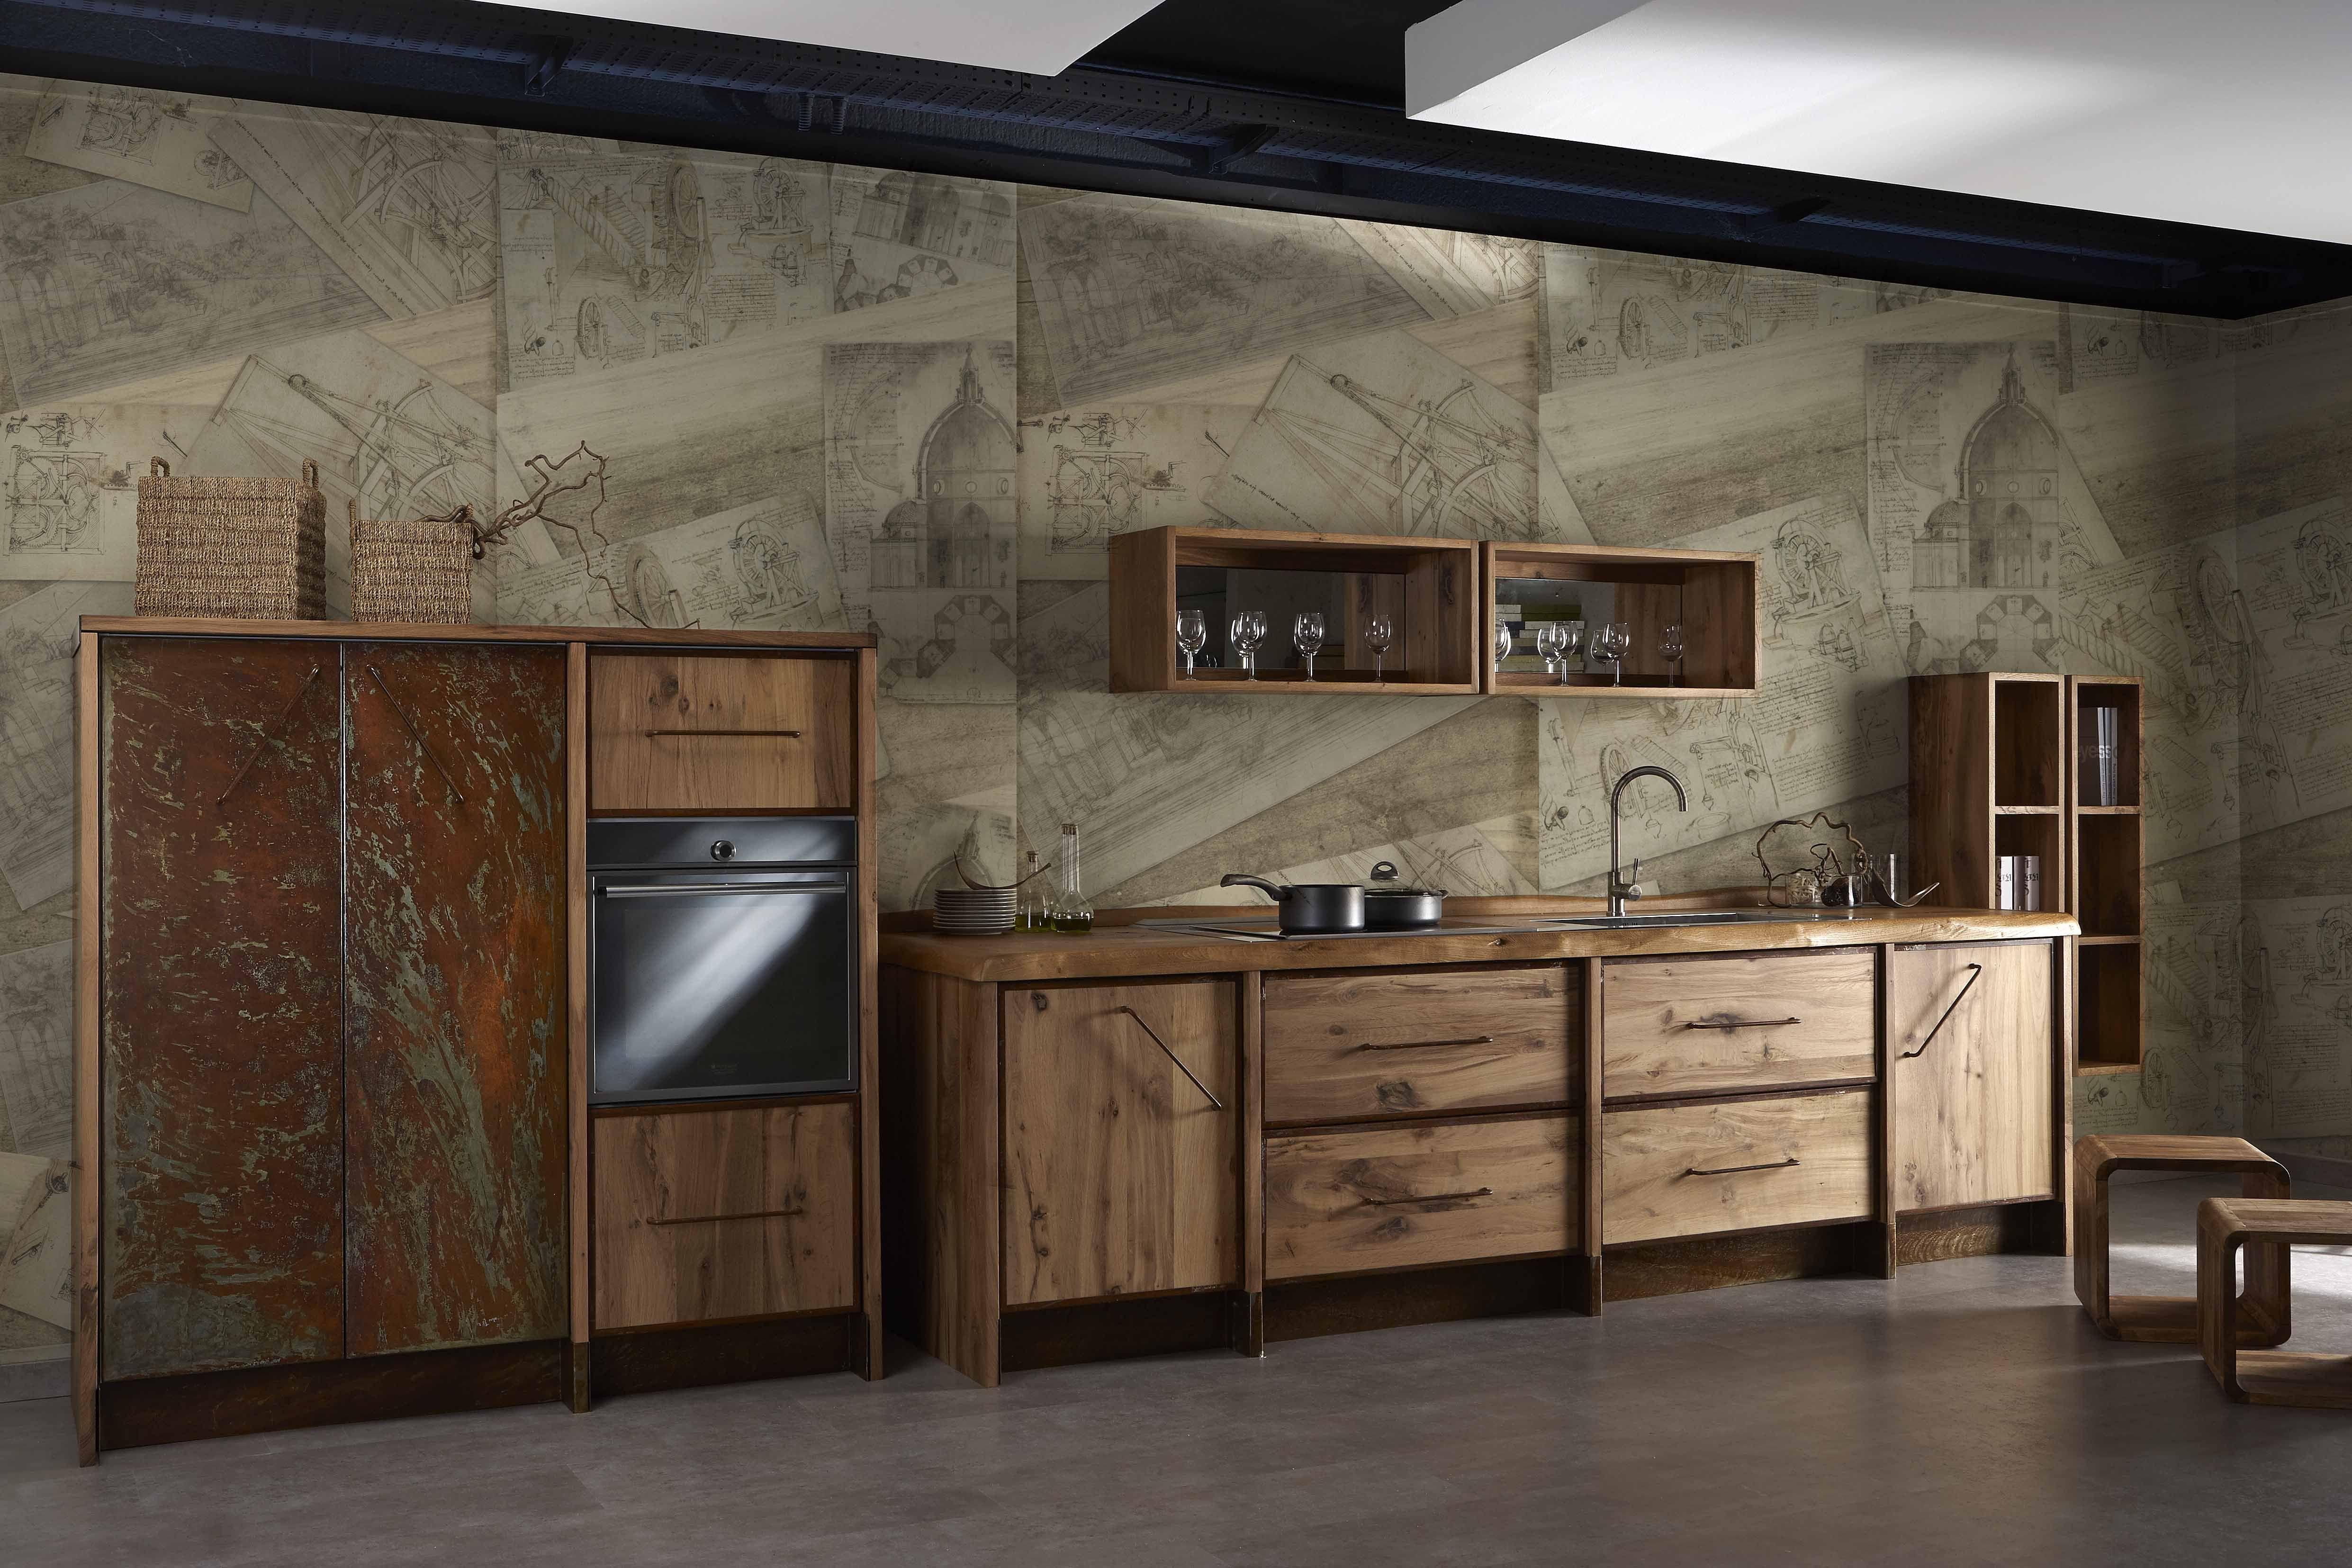 axis cucine da vinci kitchen cabinet modular system oak wood kitchen vintage axis cucine. Black Bedroom Furniture Sets. Home Design Ideas